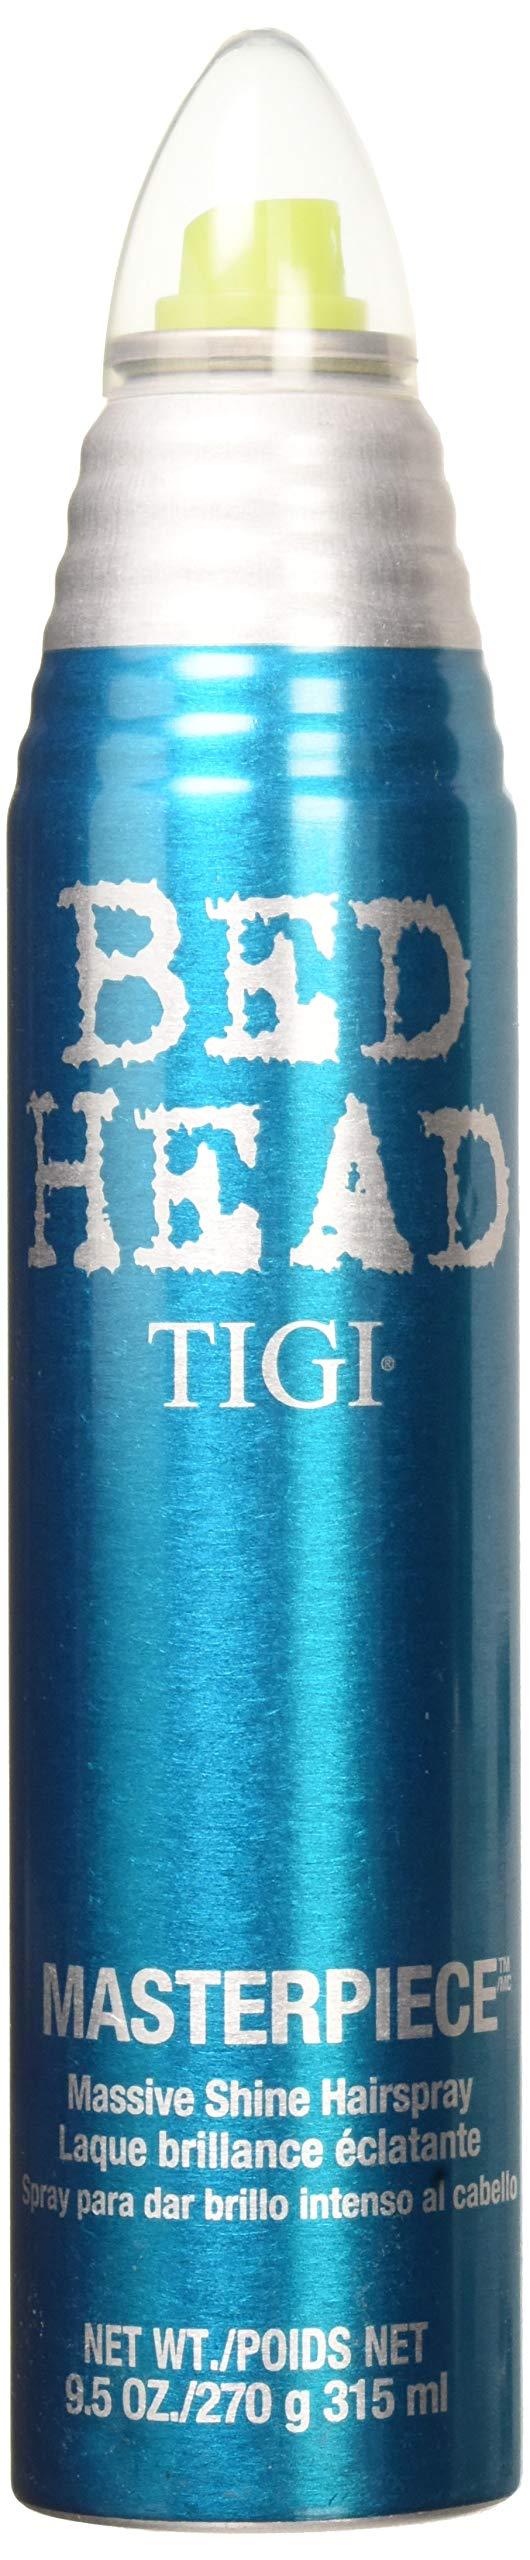 TIGI Bed Head Masterpiece Shine Hairspray (Original Version), 9.5 Ounce (Pack of 1)